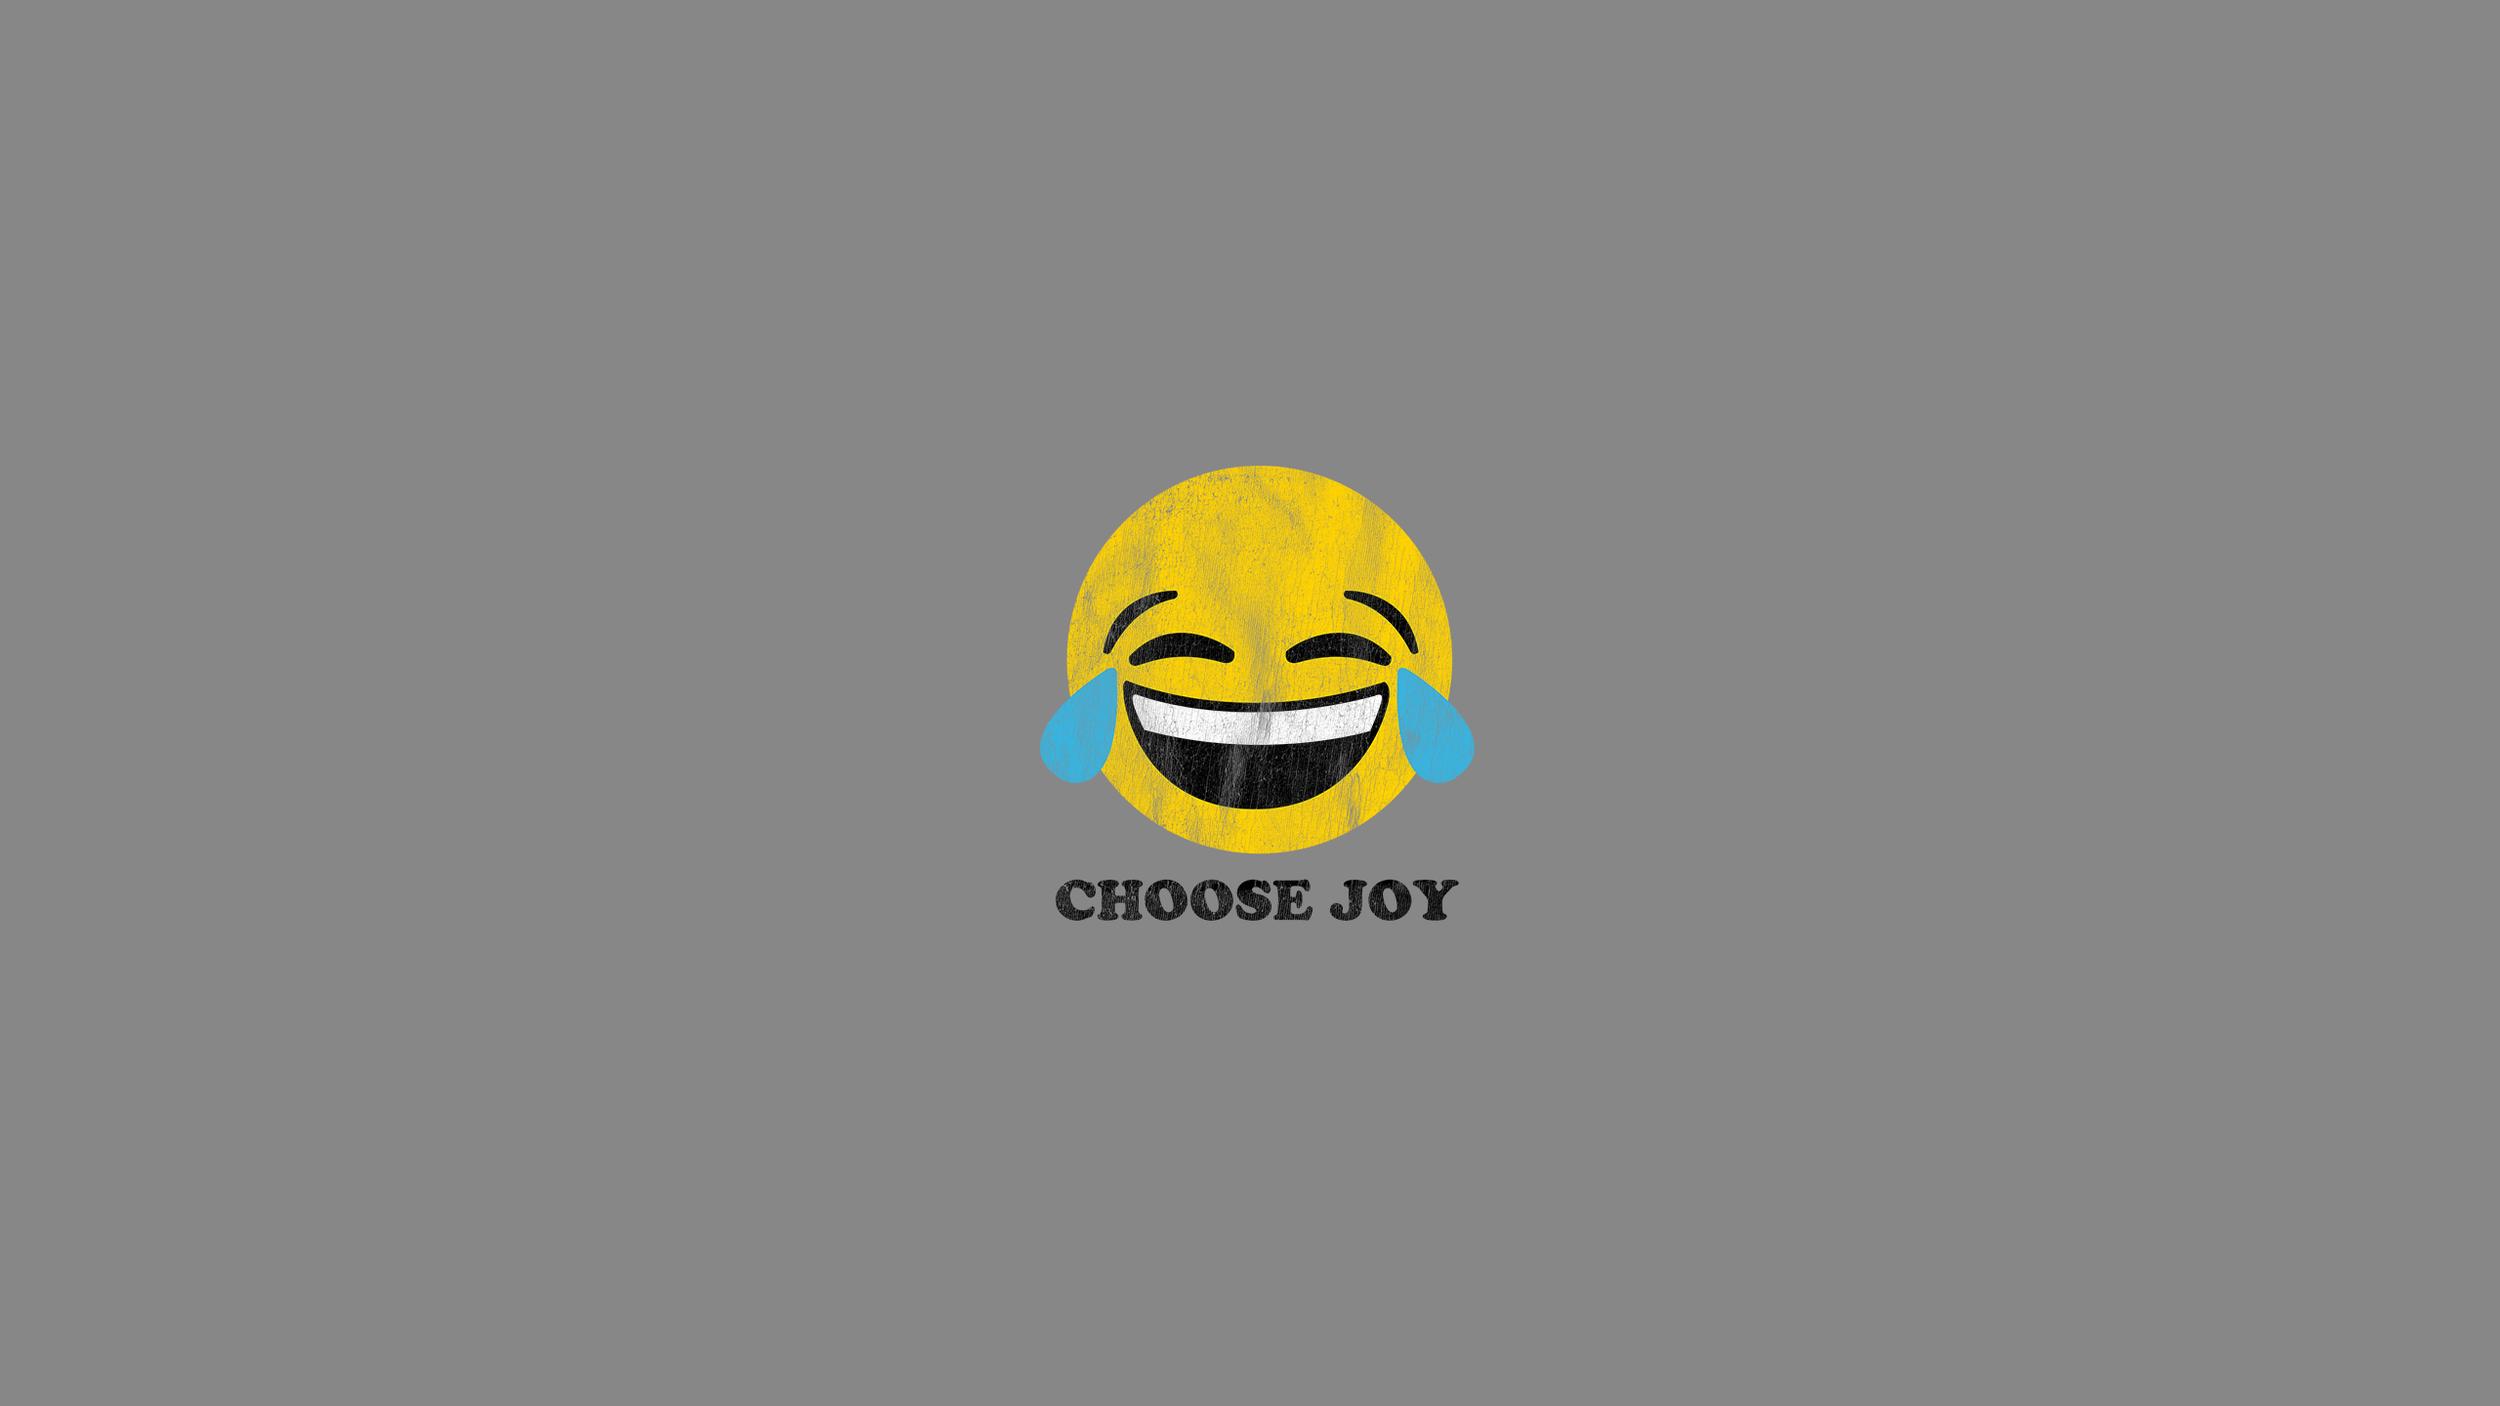 Choose-joy-imac.png